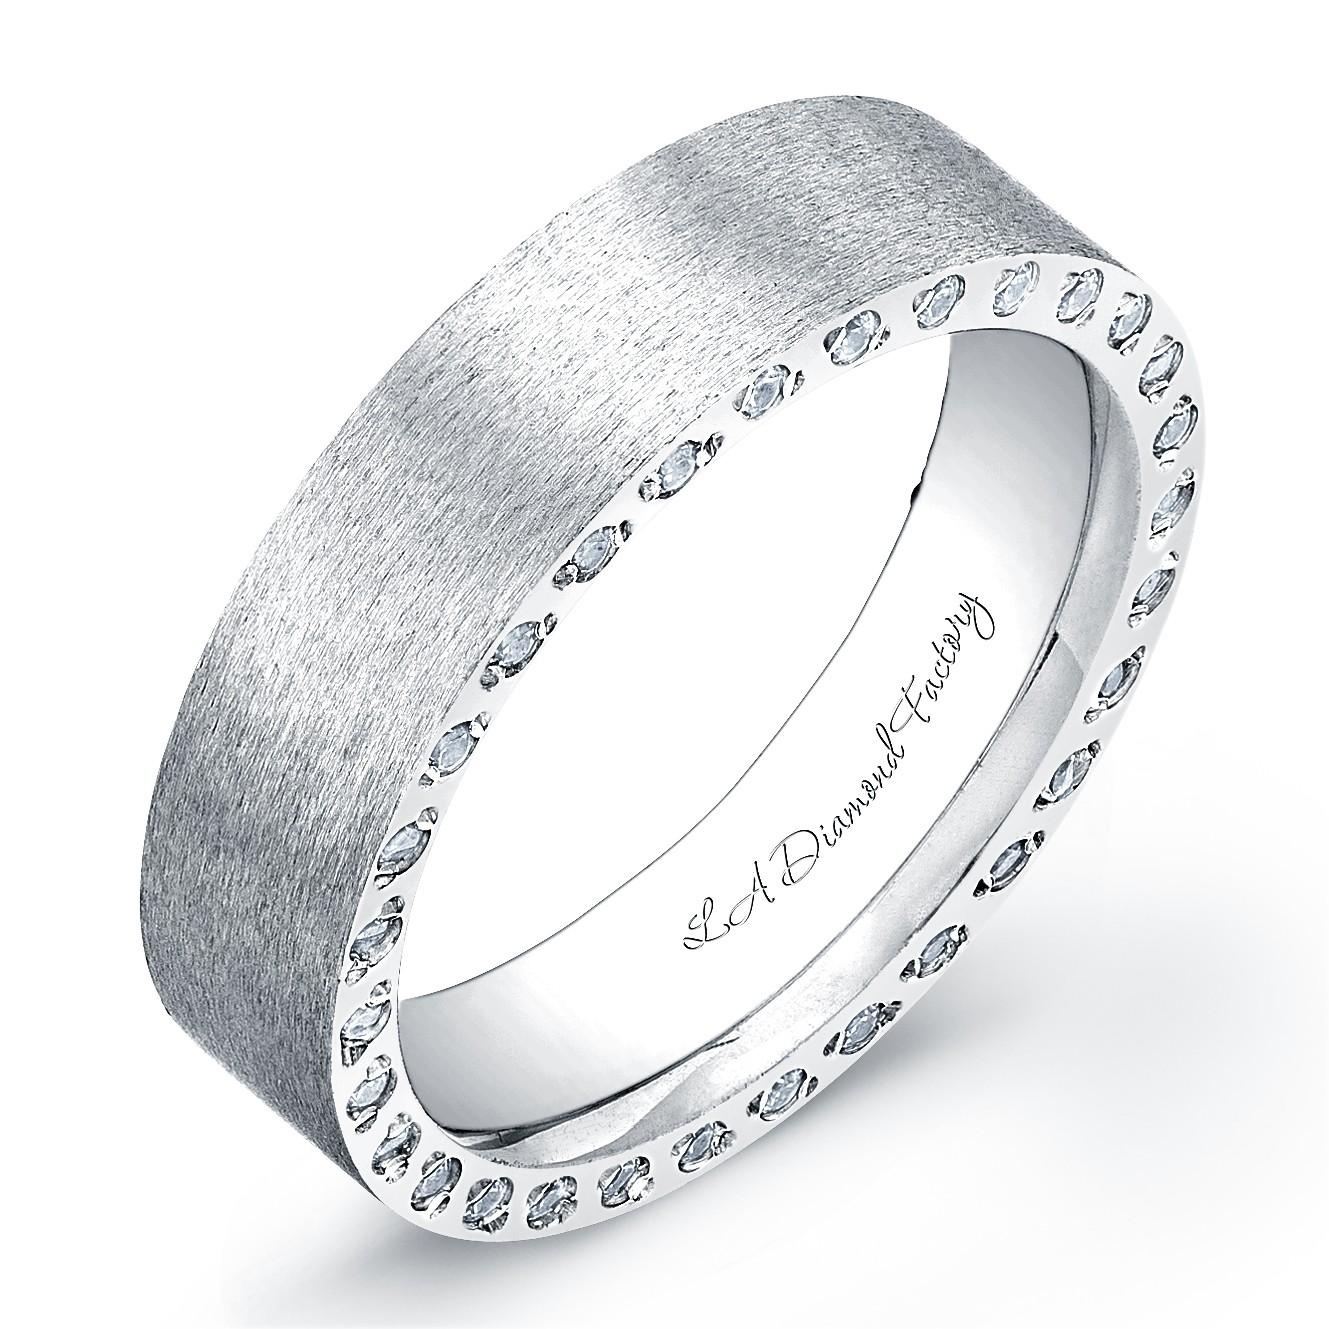 la diamond factory men s wedding band mens diamond wedding bands LA Diamond Factory Men s Wedding Band Matte